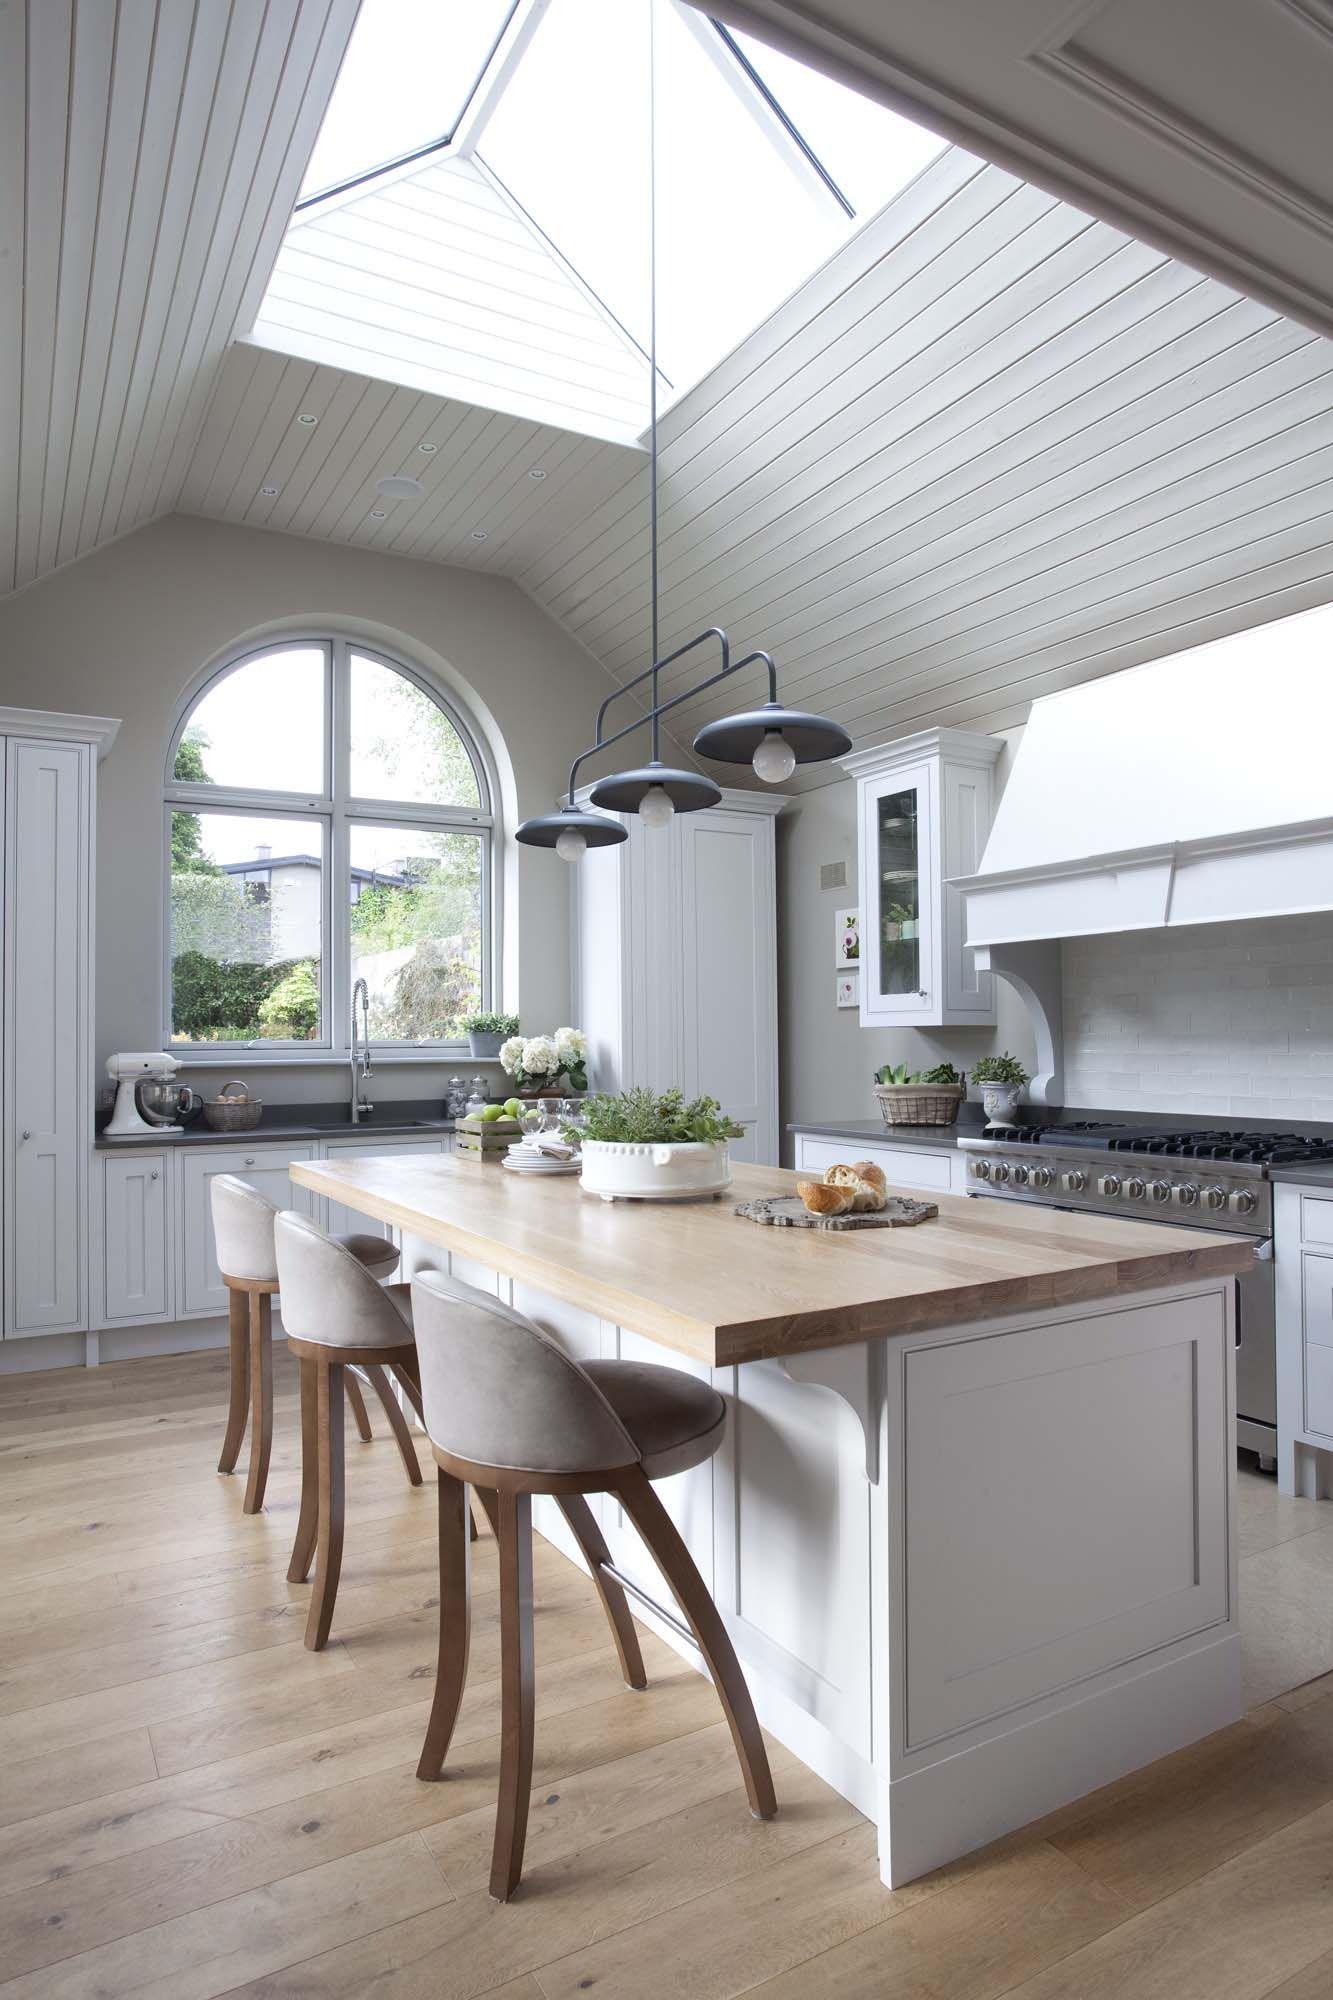 Shelf across kitchen window  farmhouse kitchen  handmade furniture  custom interiors  bfinde